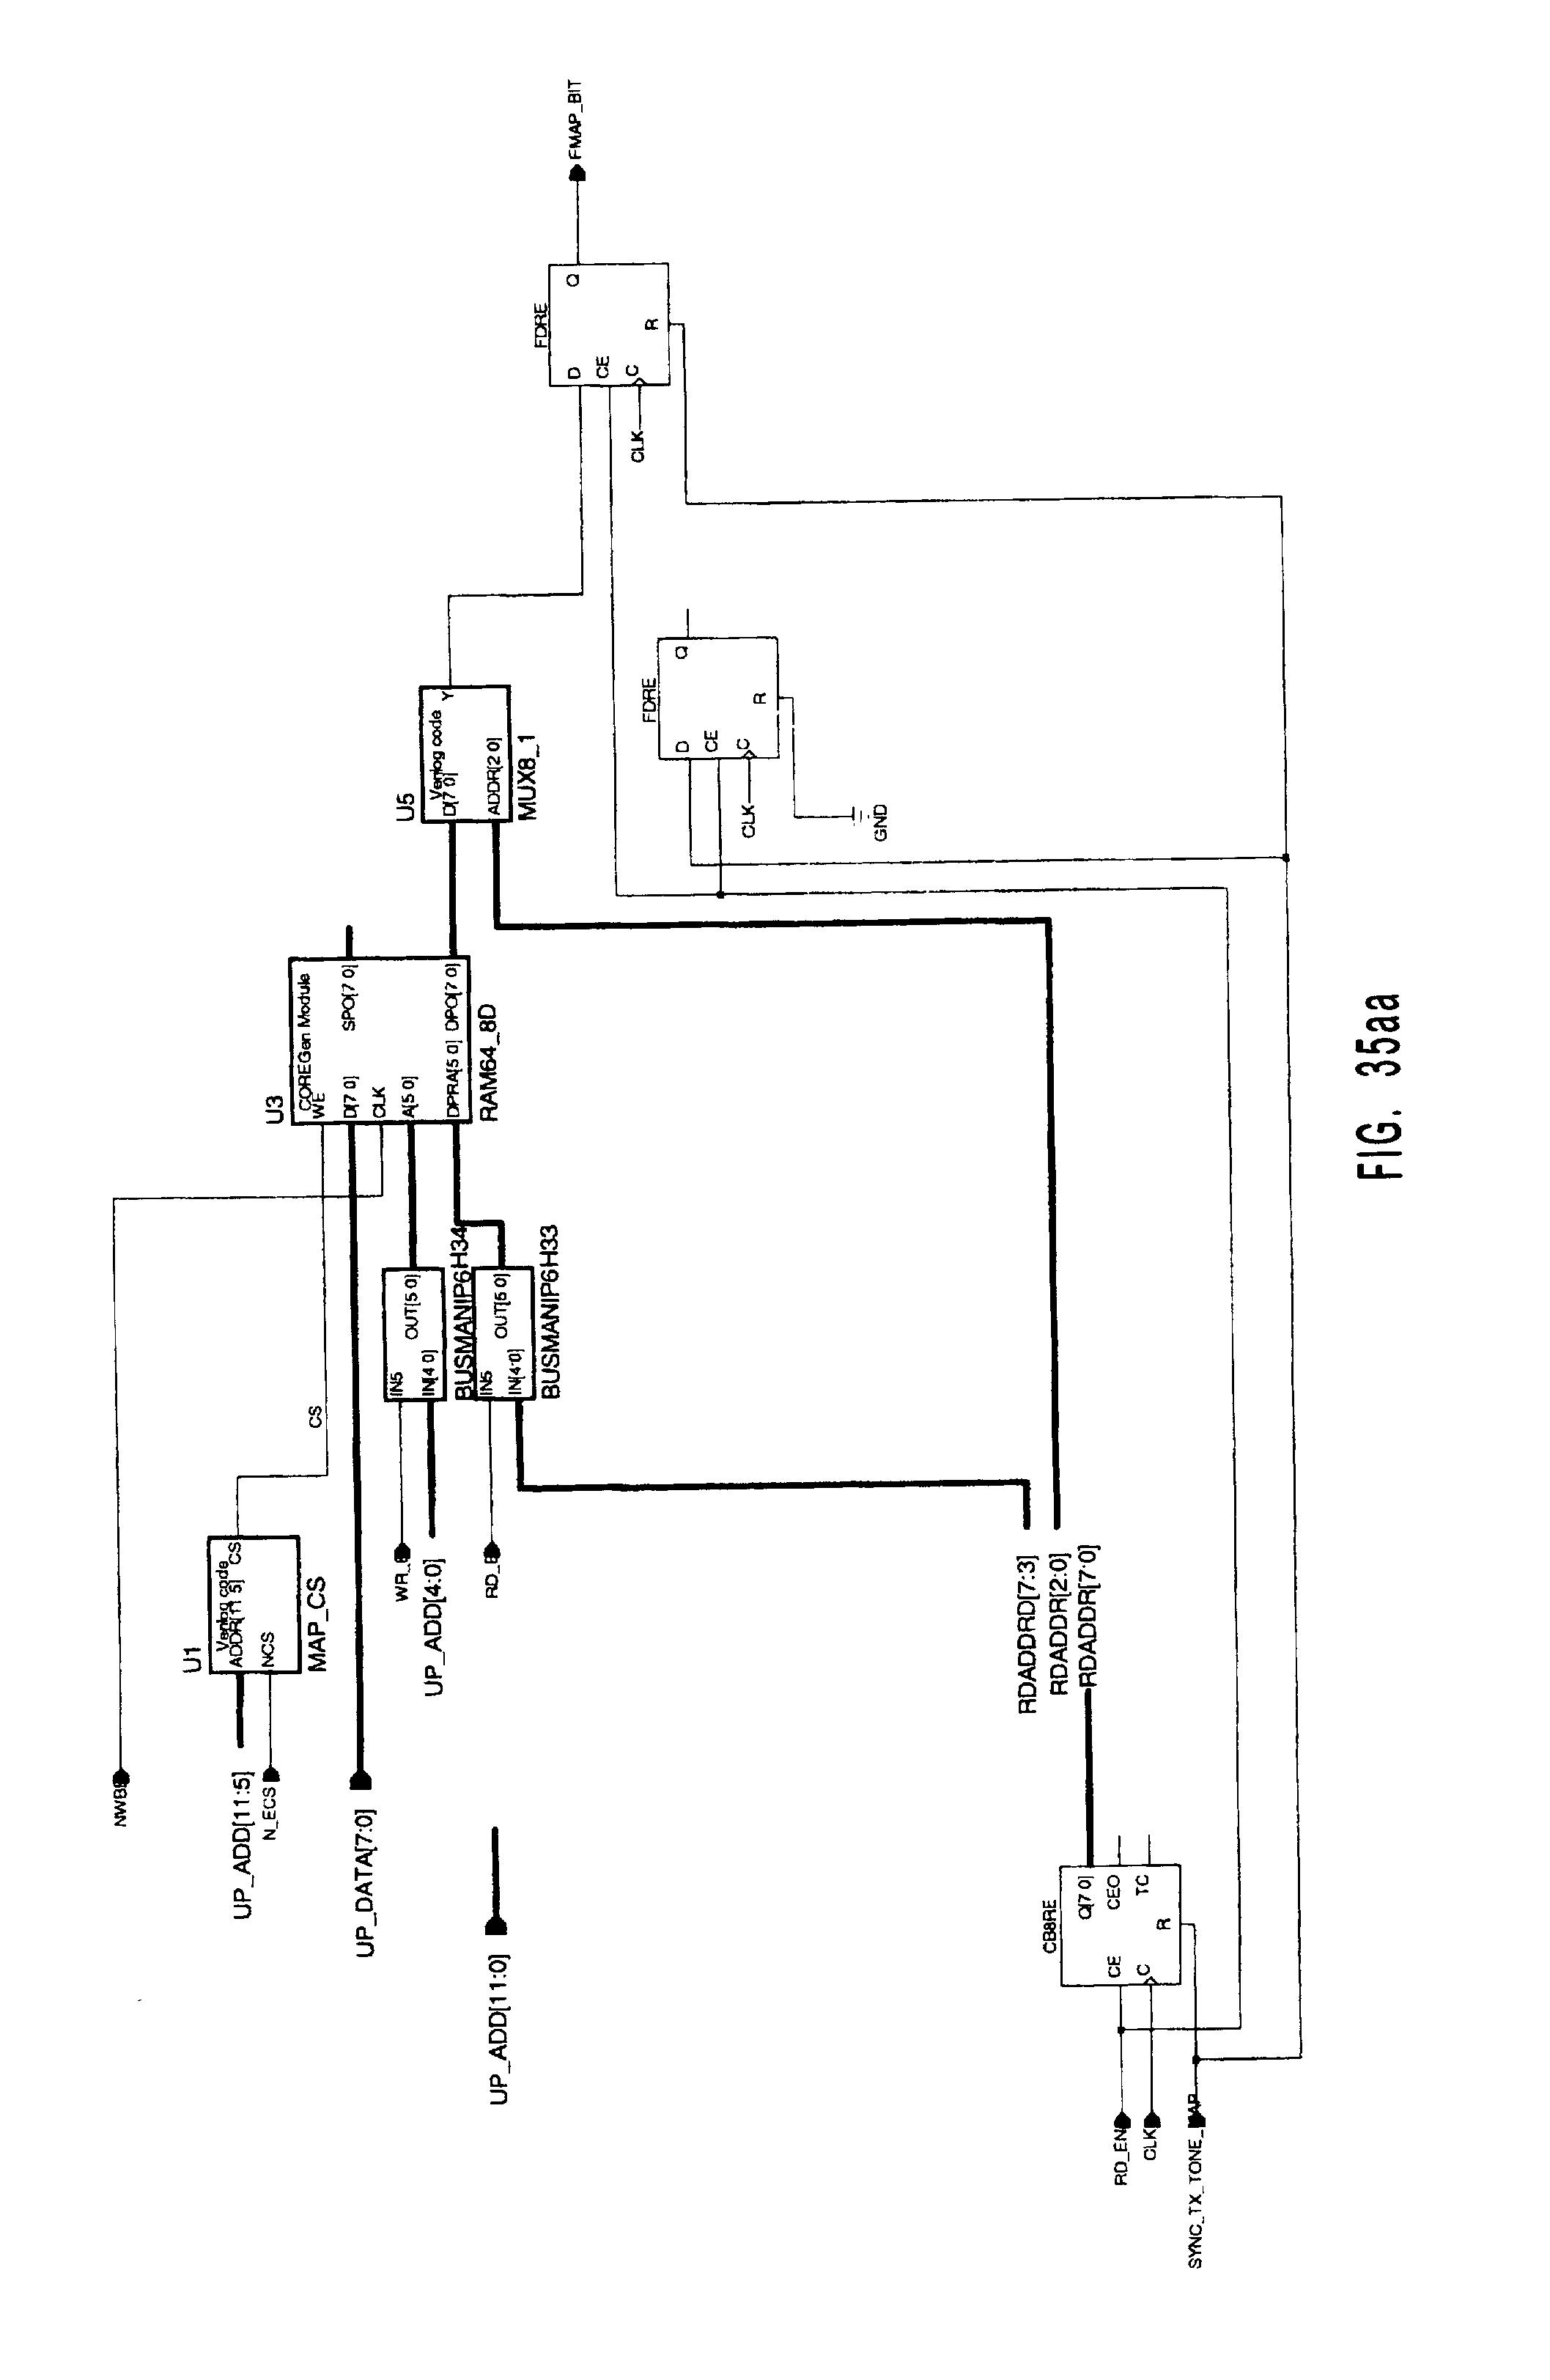 2000 chevy blazer encoder motor wiring diagram 2000 chevy